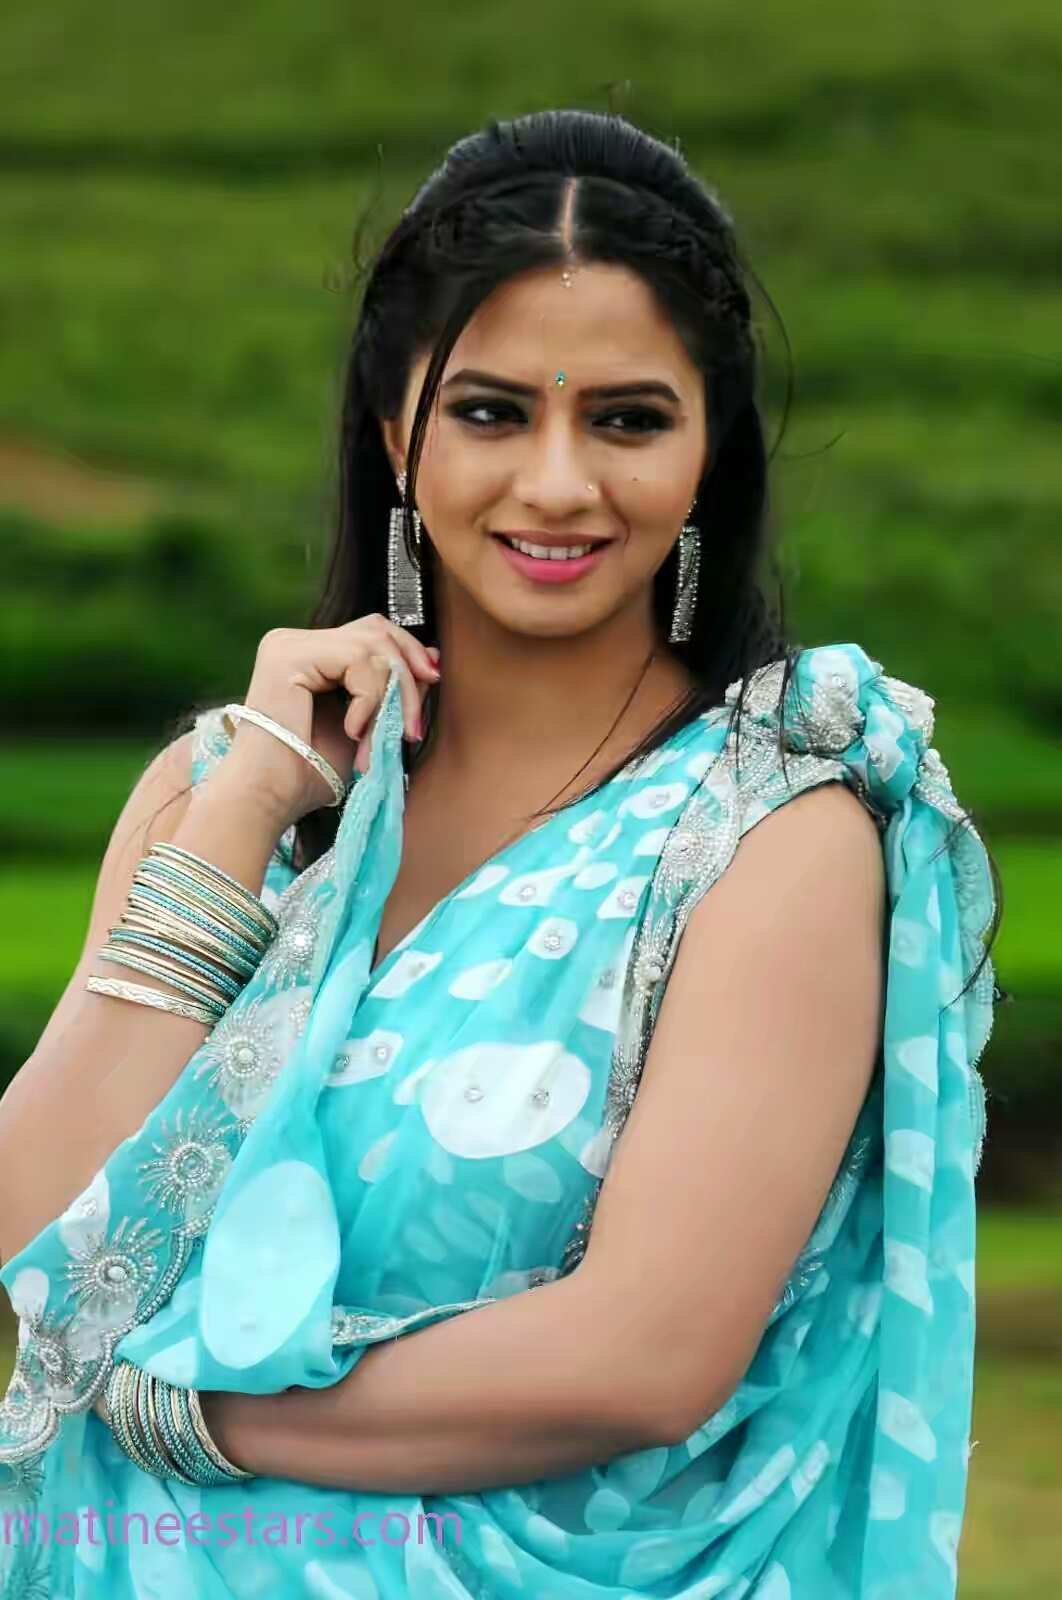 Actress Nisha Shah in Churidar Cute Stills | New Movie Posters